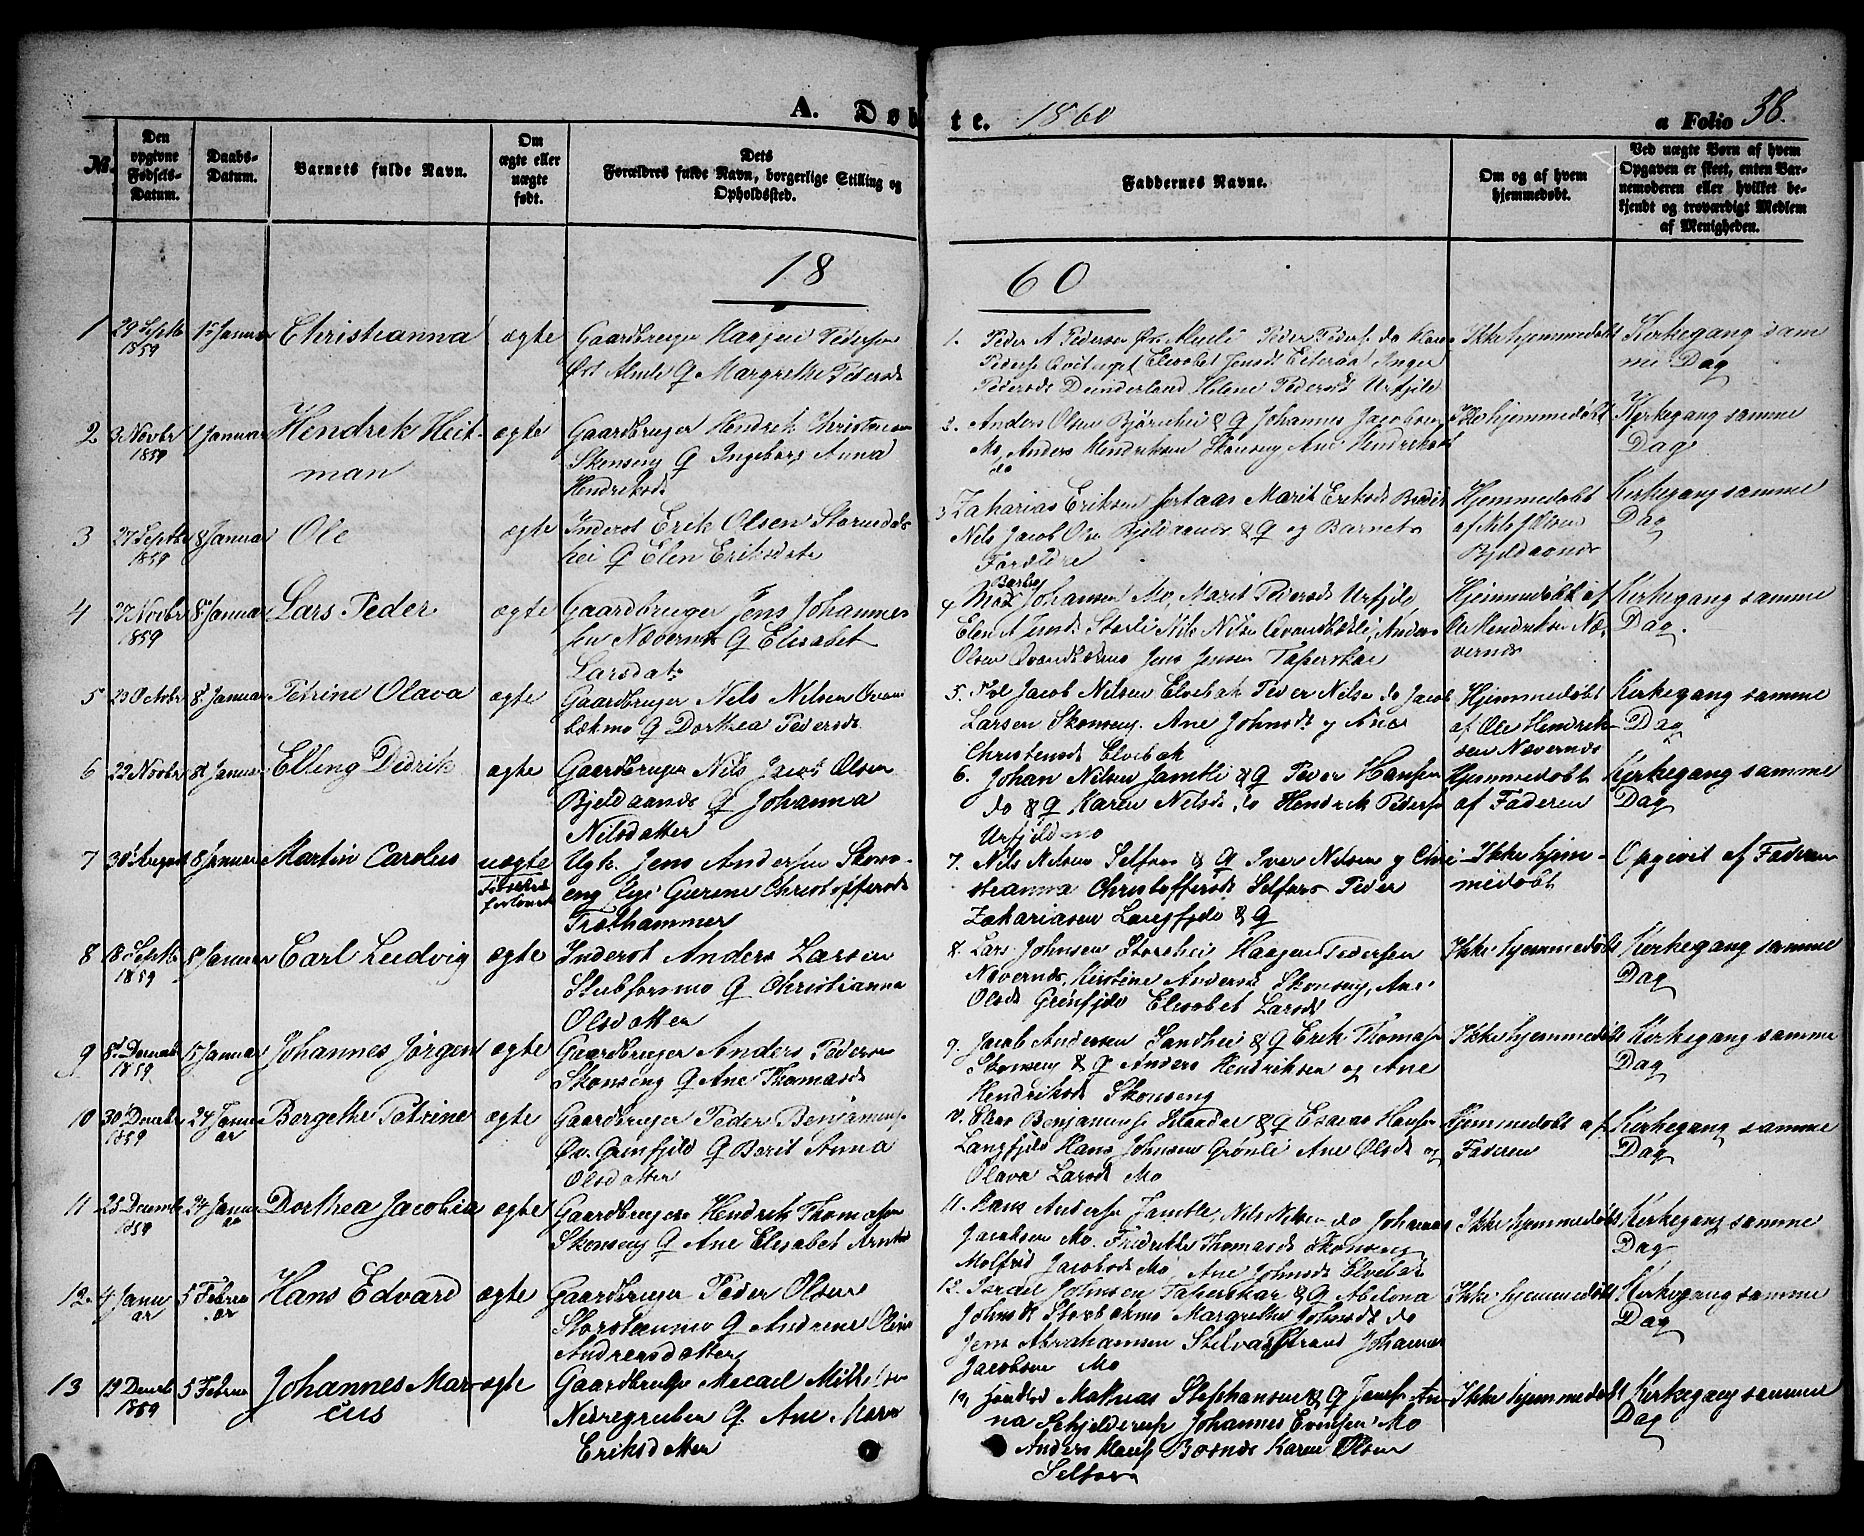 SAT, Ministerialprotokoller, klokkerbøker og fødselsregistre - Nordland, 827/L0414: Klokkerbok nr. 827C03, 1853-1865, s. 58